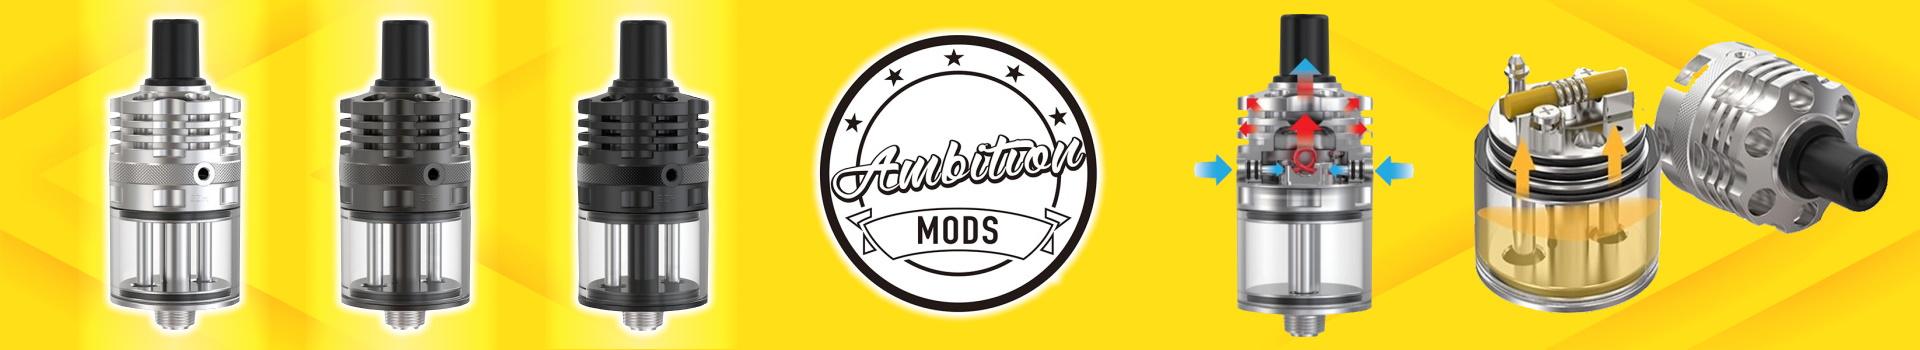 Ambition Mods - Ripley MTL / RDL RDTA Selbstw